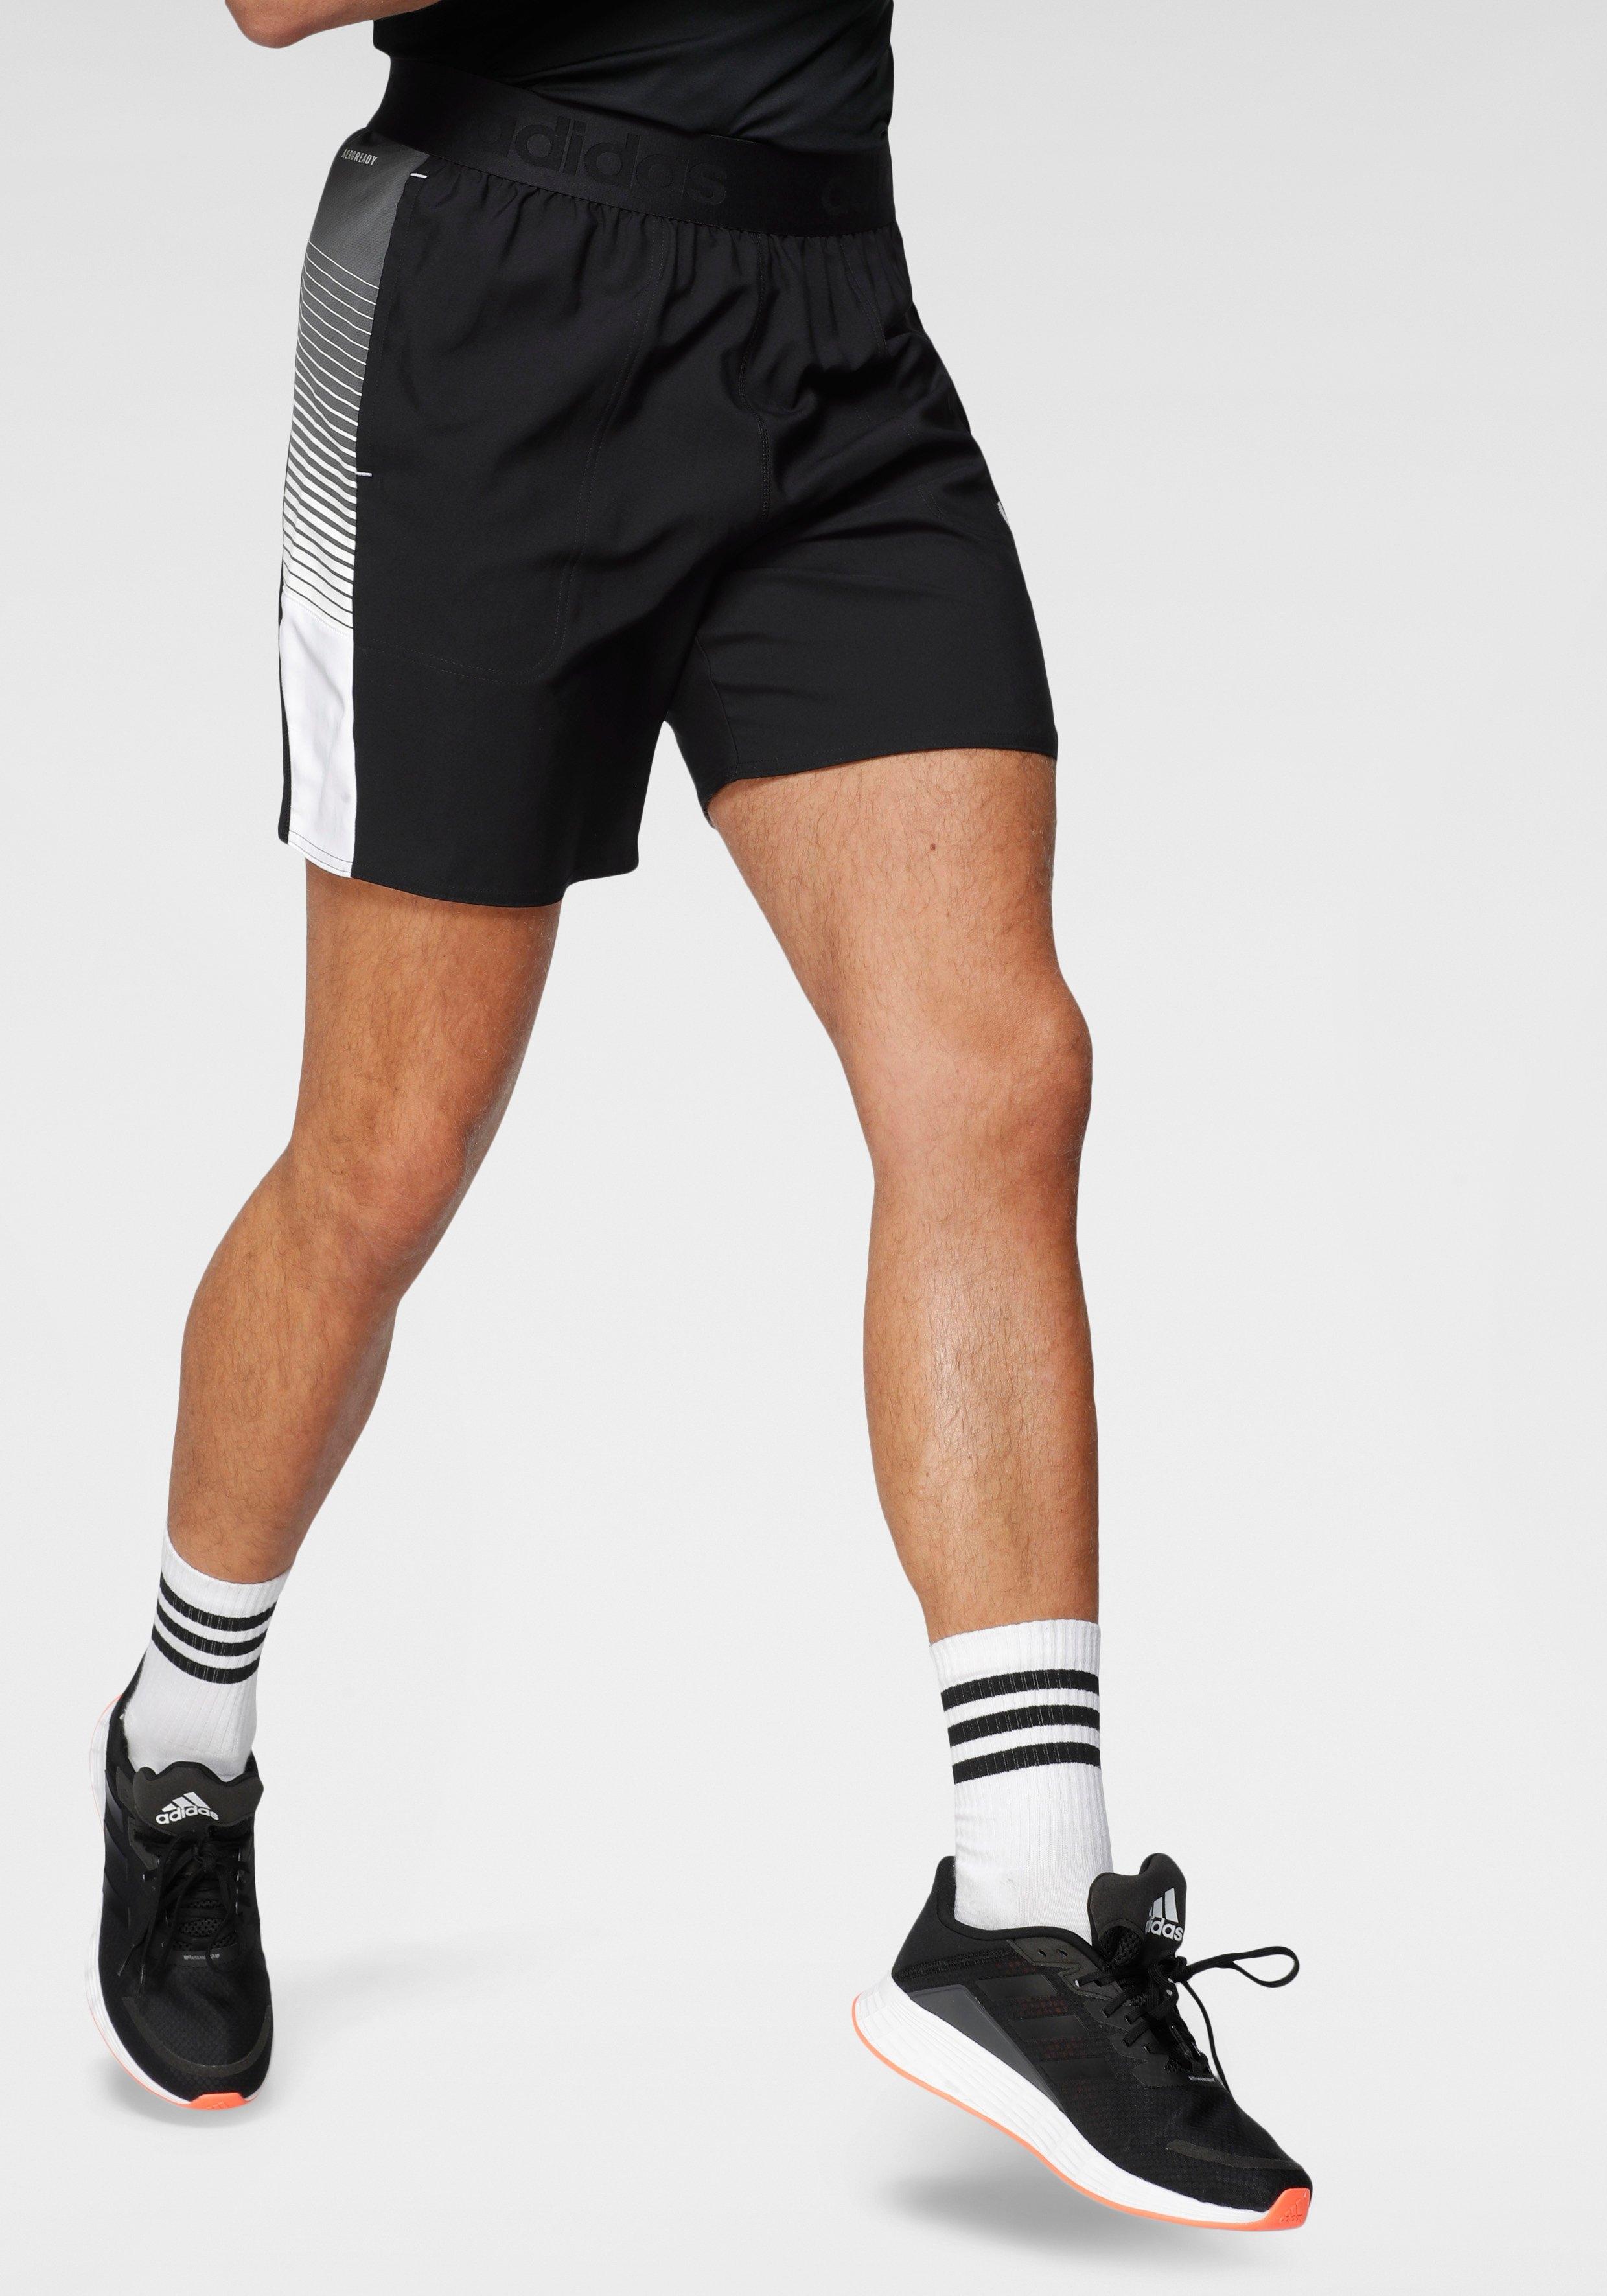 adidas trainingsshort ADIDAS MEN ACTIVATED TECH SHORT online kopen op otto.nl